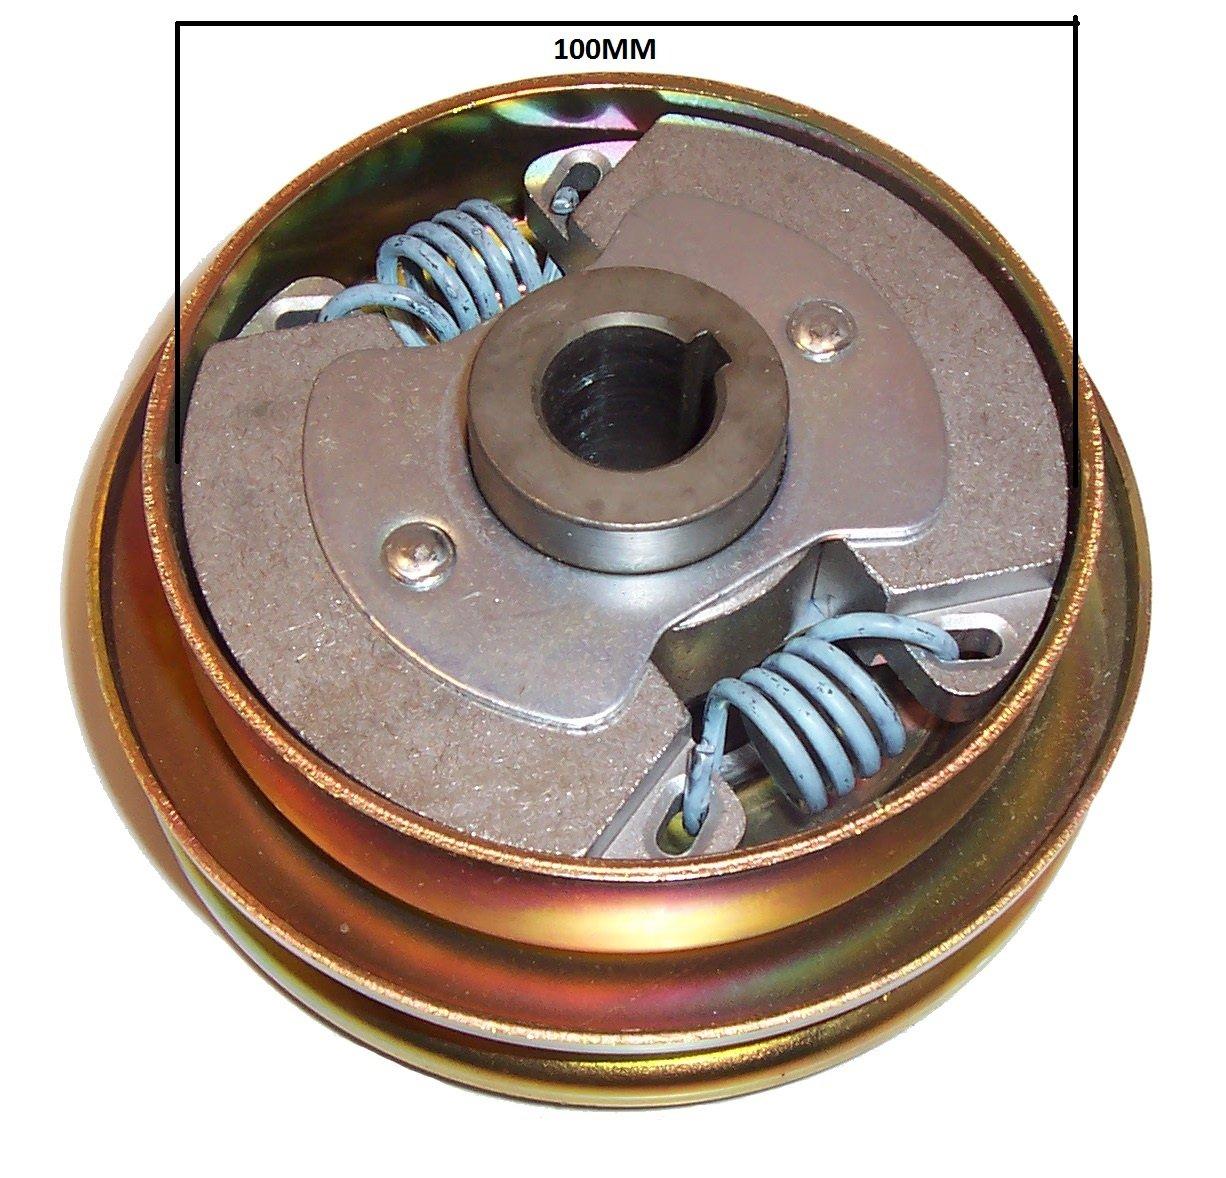 Embrague centrífugo para adaptarse a una 19 mm (3/4